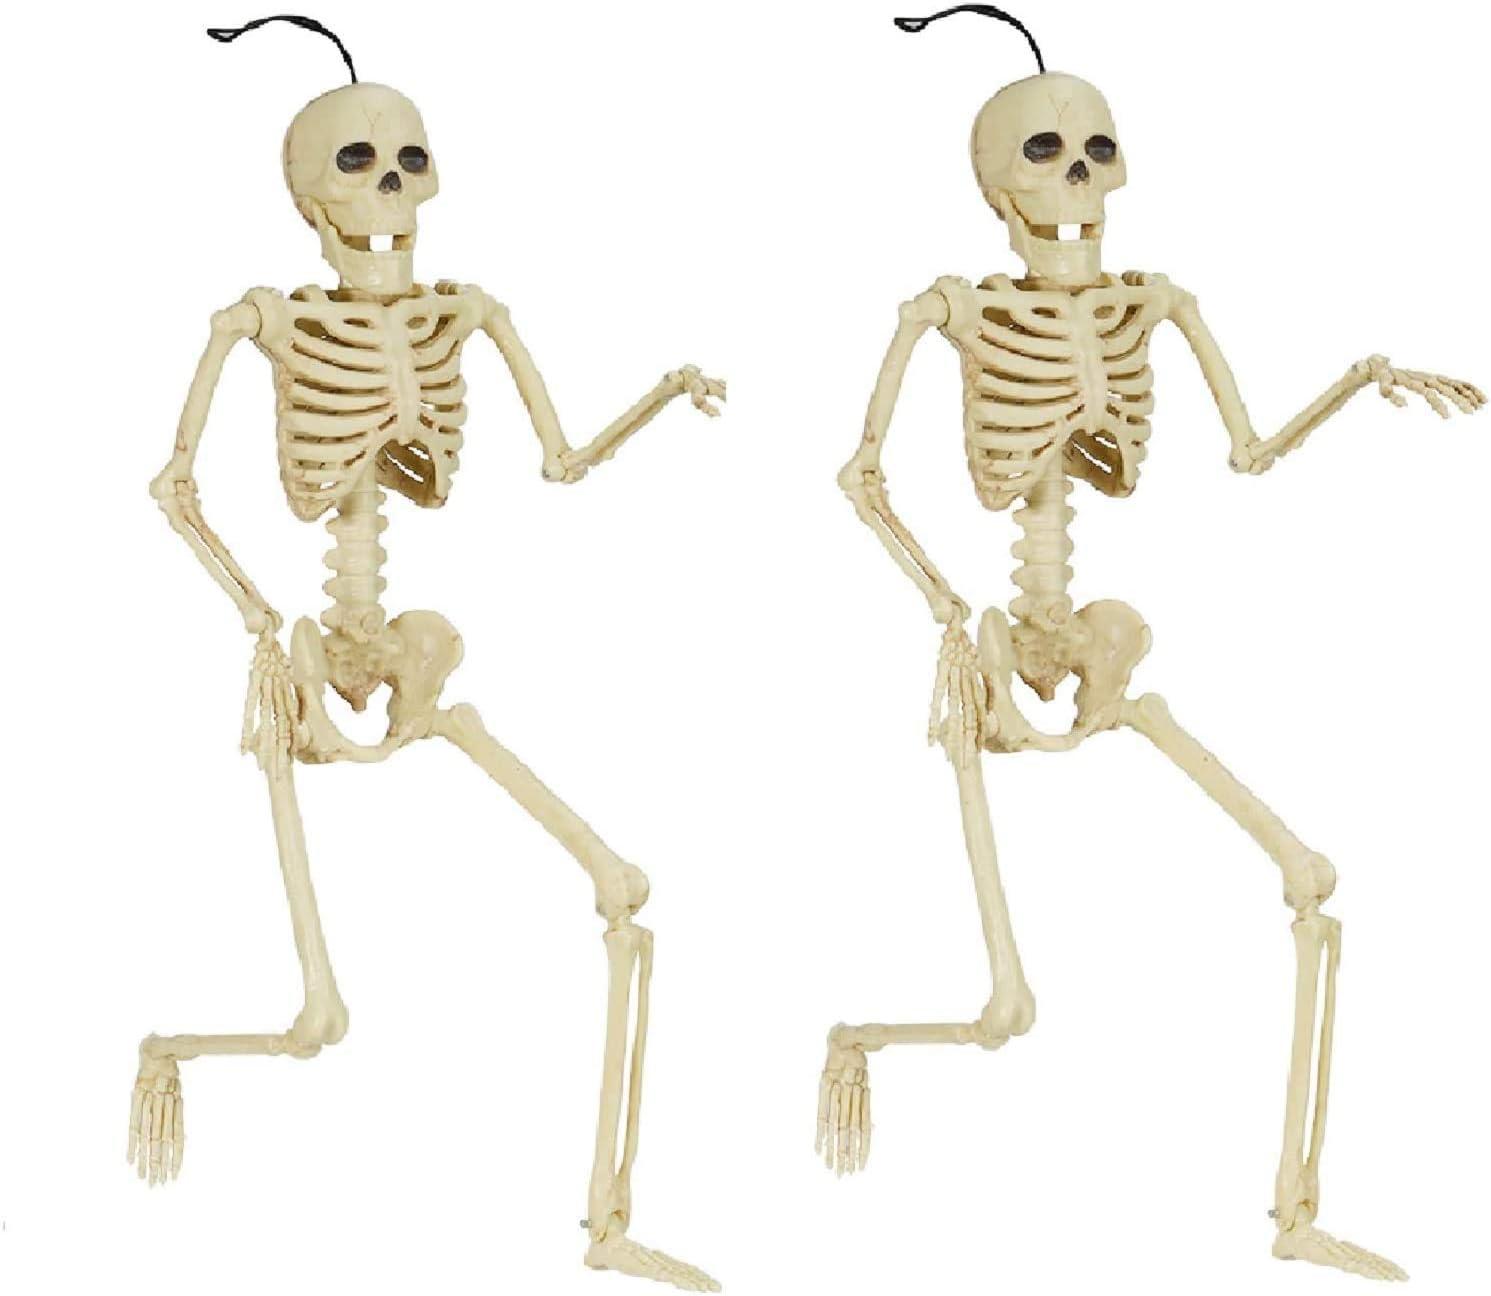 Halloween Skeleton Set Skull Full Body Halloween Skeleton, Funny Hipster Skull Skeleton Decoration Bone Décor, 2 Sets of Body Accessories for Best Halloween Decoration